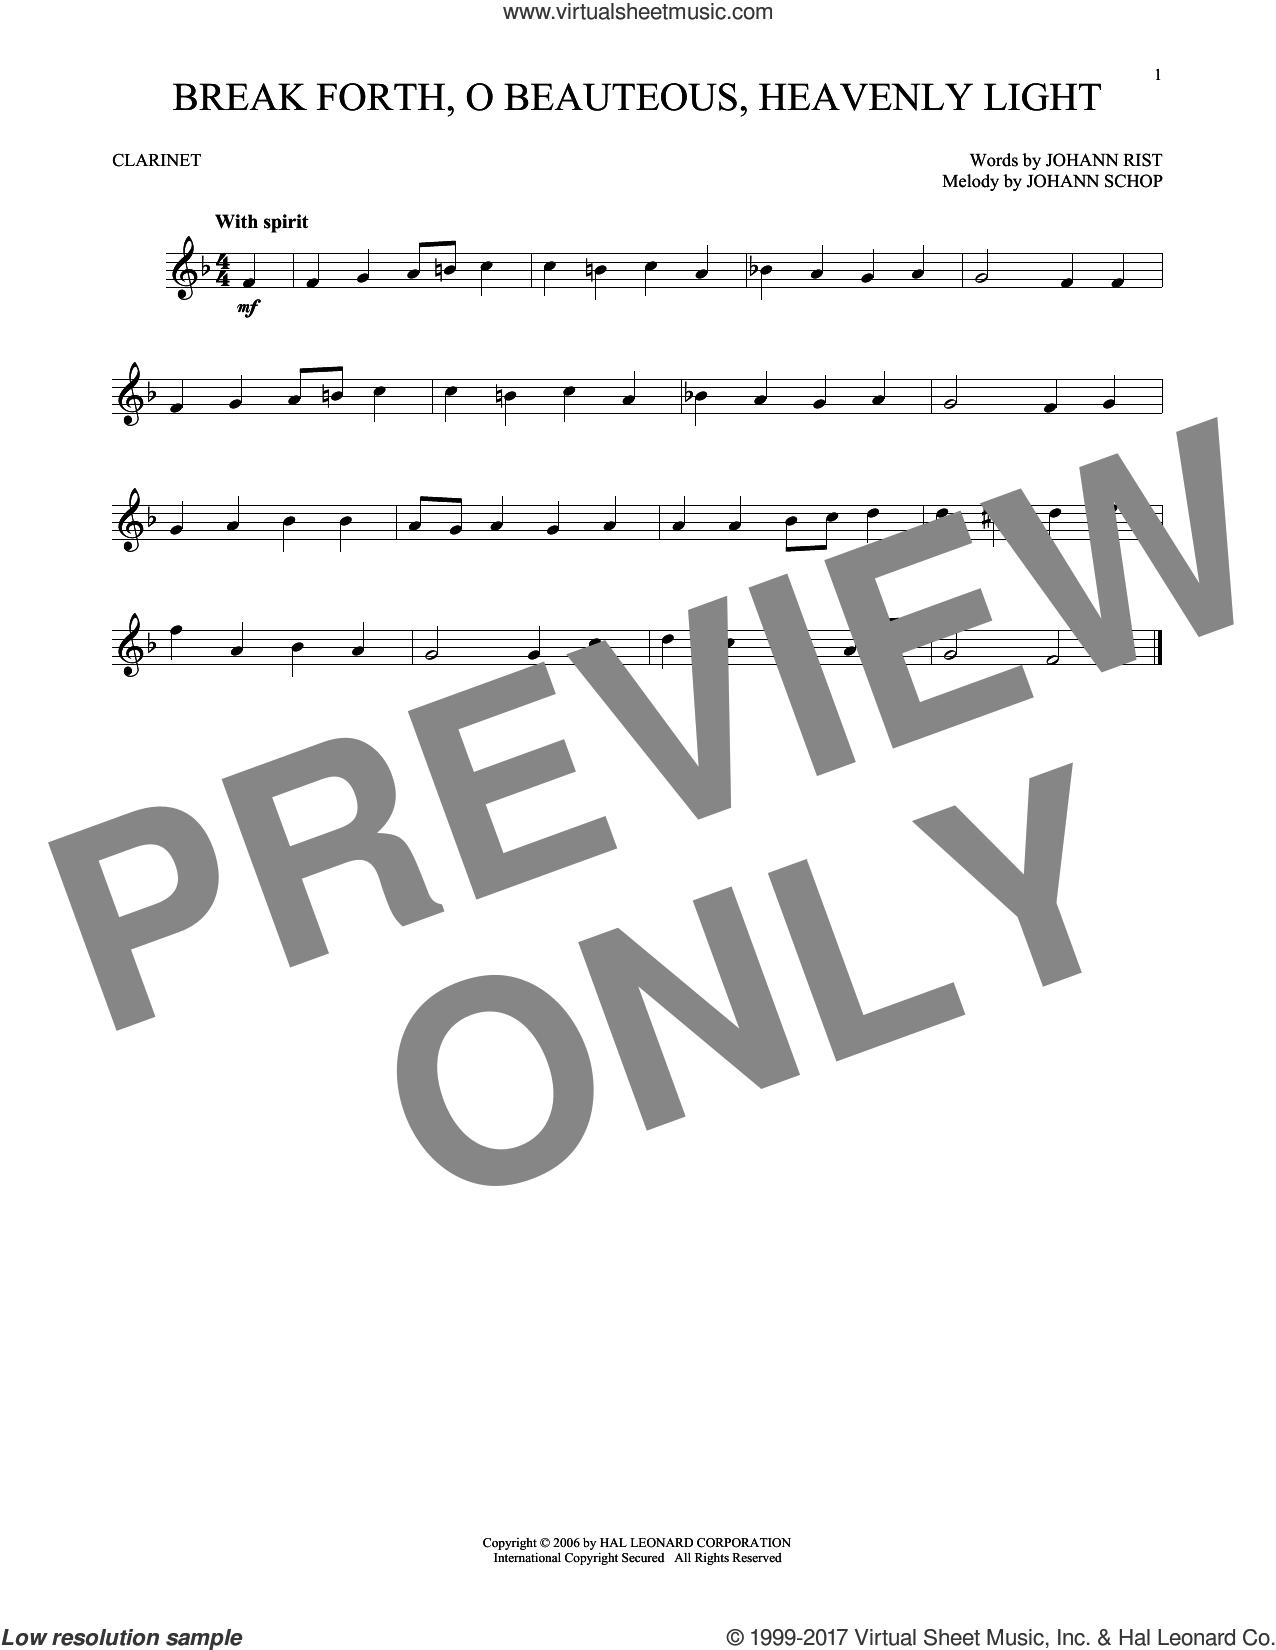 Break Forth, O Beauteous, Heavenly Light sheet music for clarinet solo by Johann Sebastian Bach, Johann Rist, Johann Schop and John Troutbeck (trans.), classical score, intermediate skill level